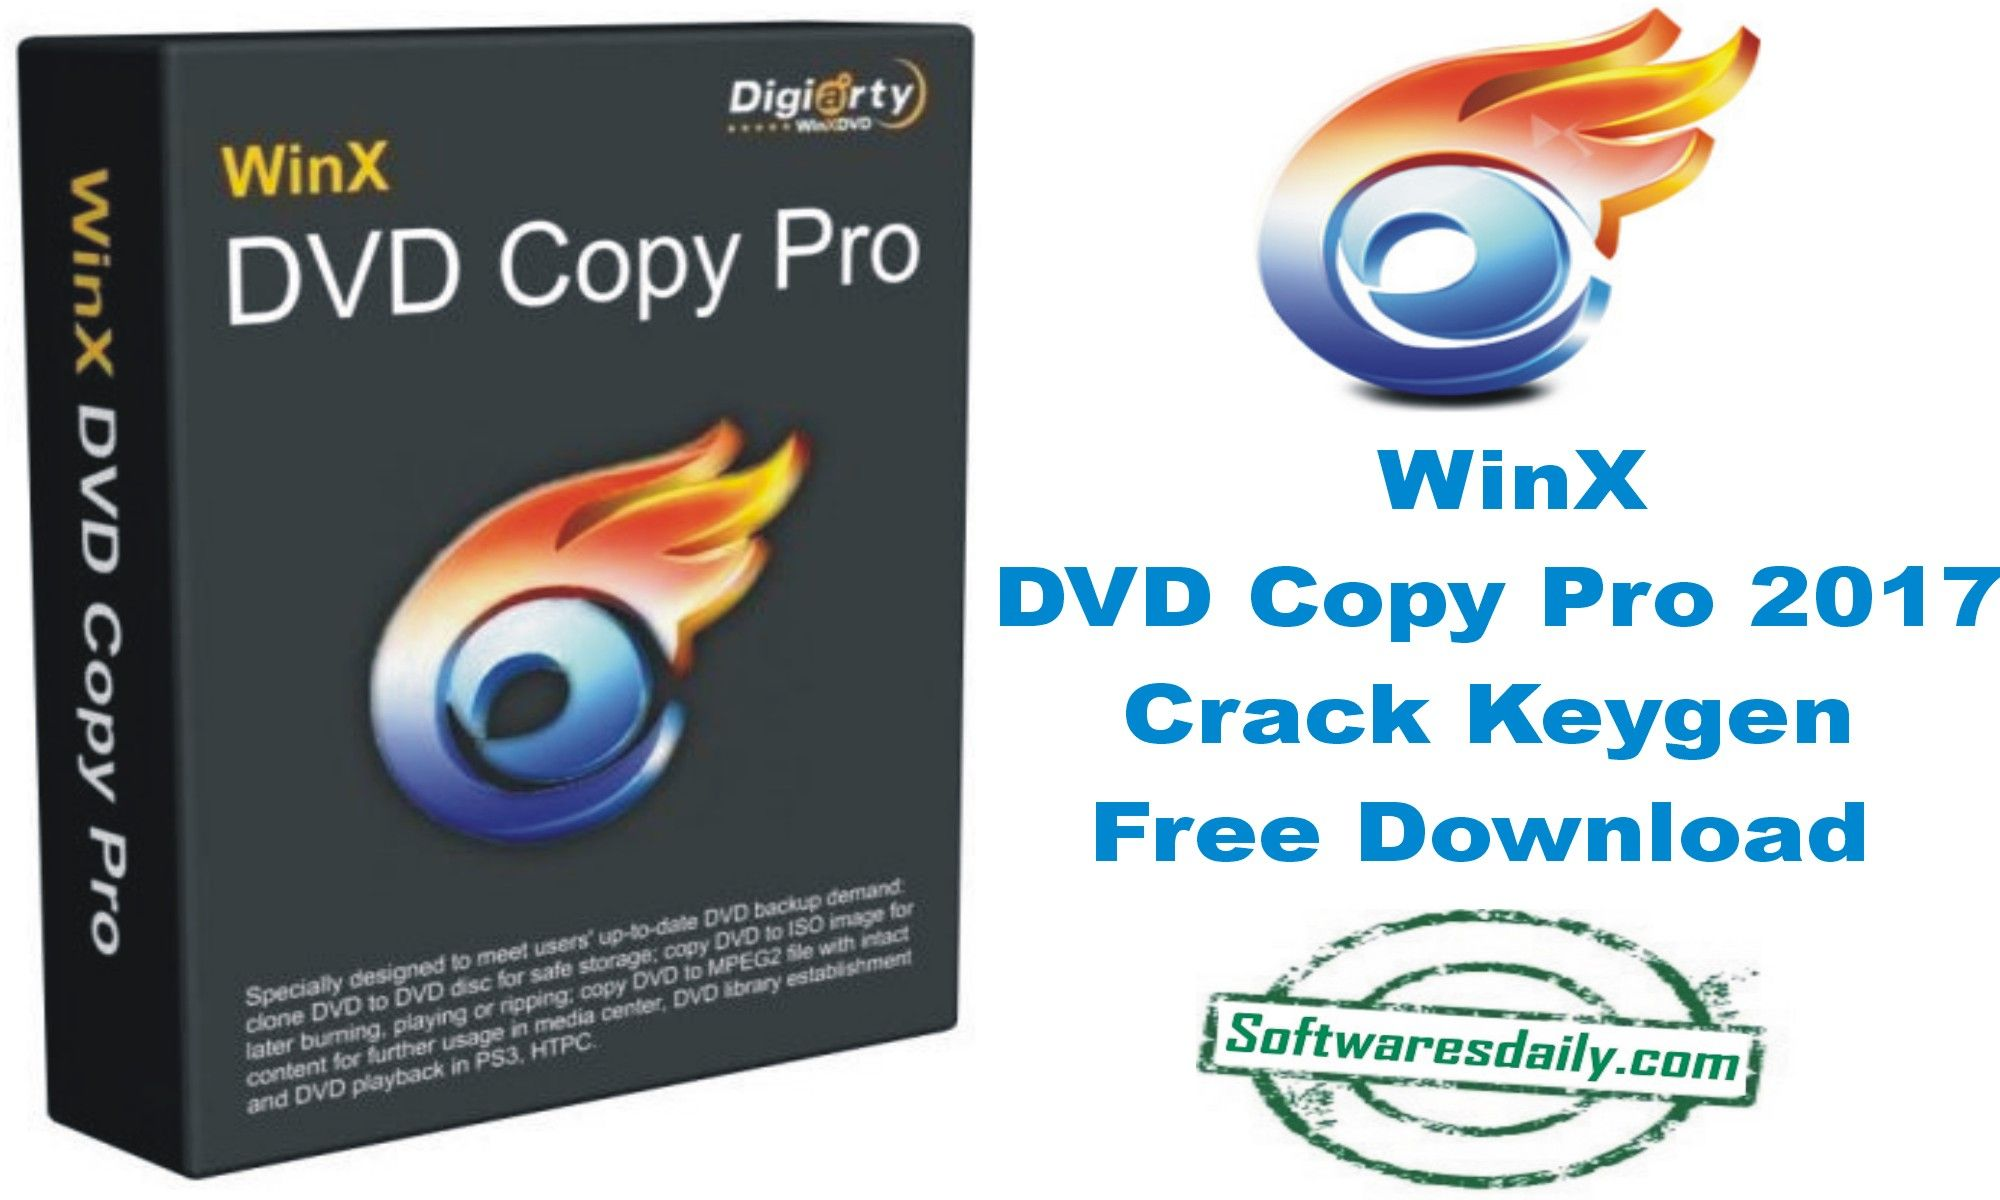 WinX DVD Copy Pro 2017 Crack Keygen Free Download, WinX DVD Copy Pro